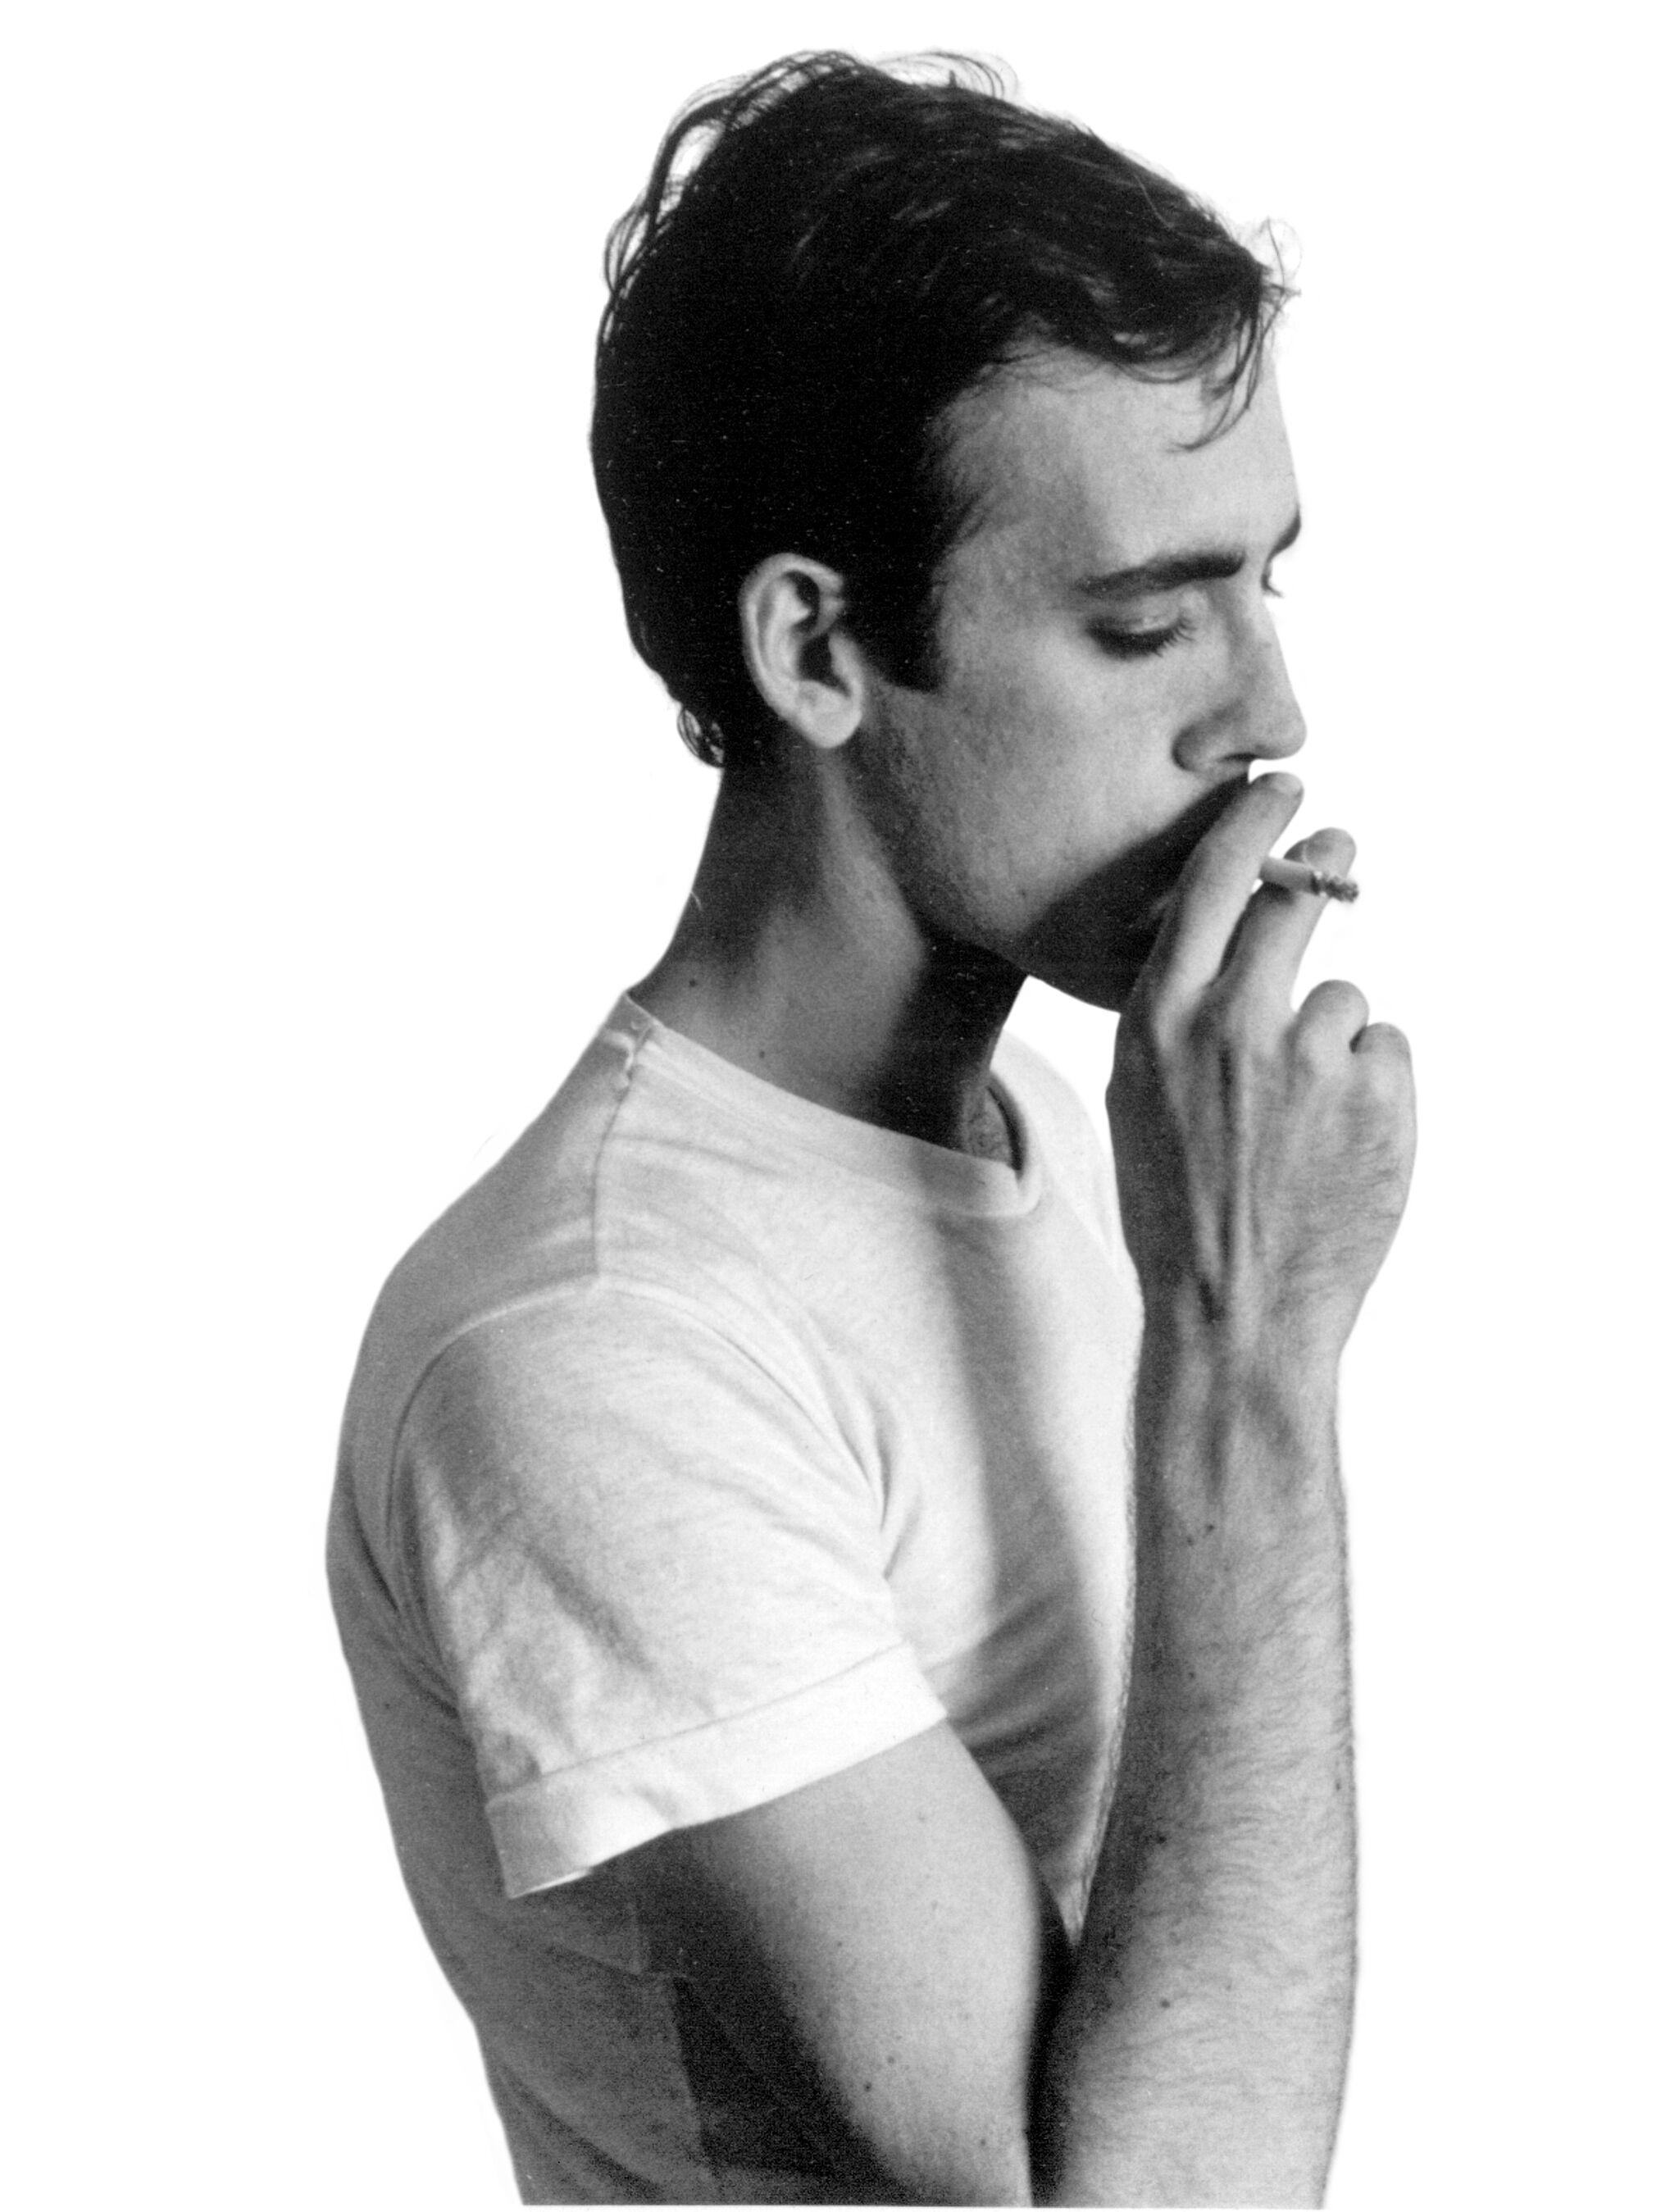 David Wojnarowicz smoking a cigarette.